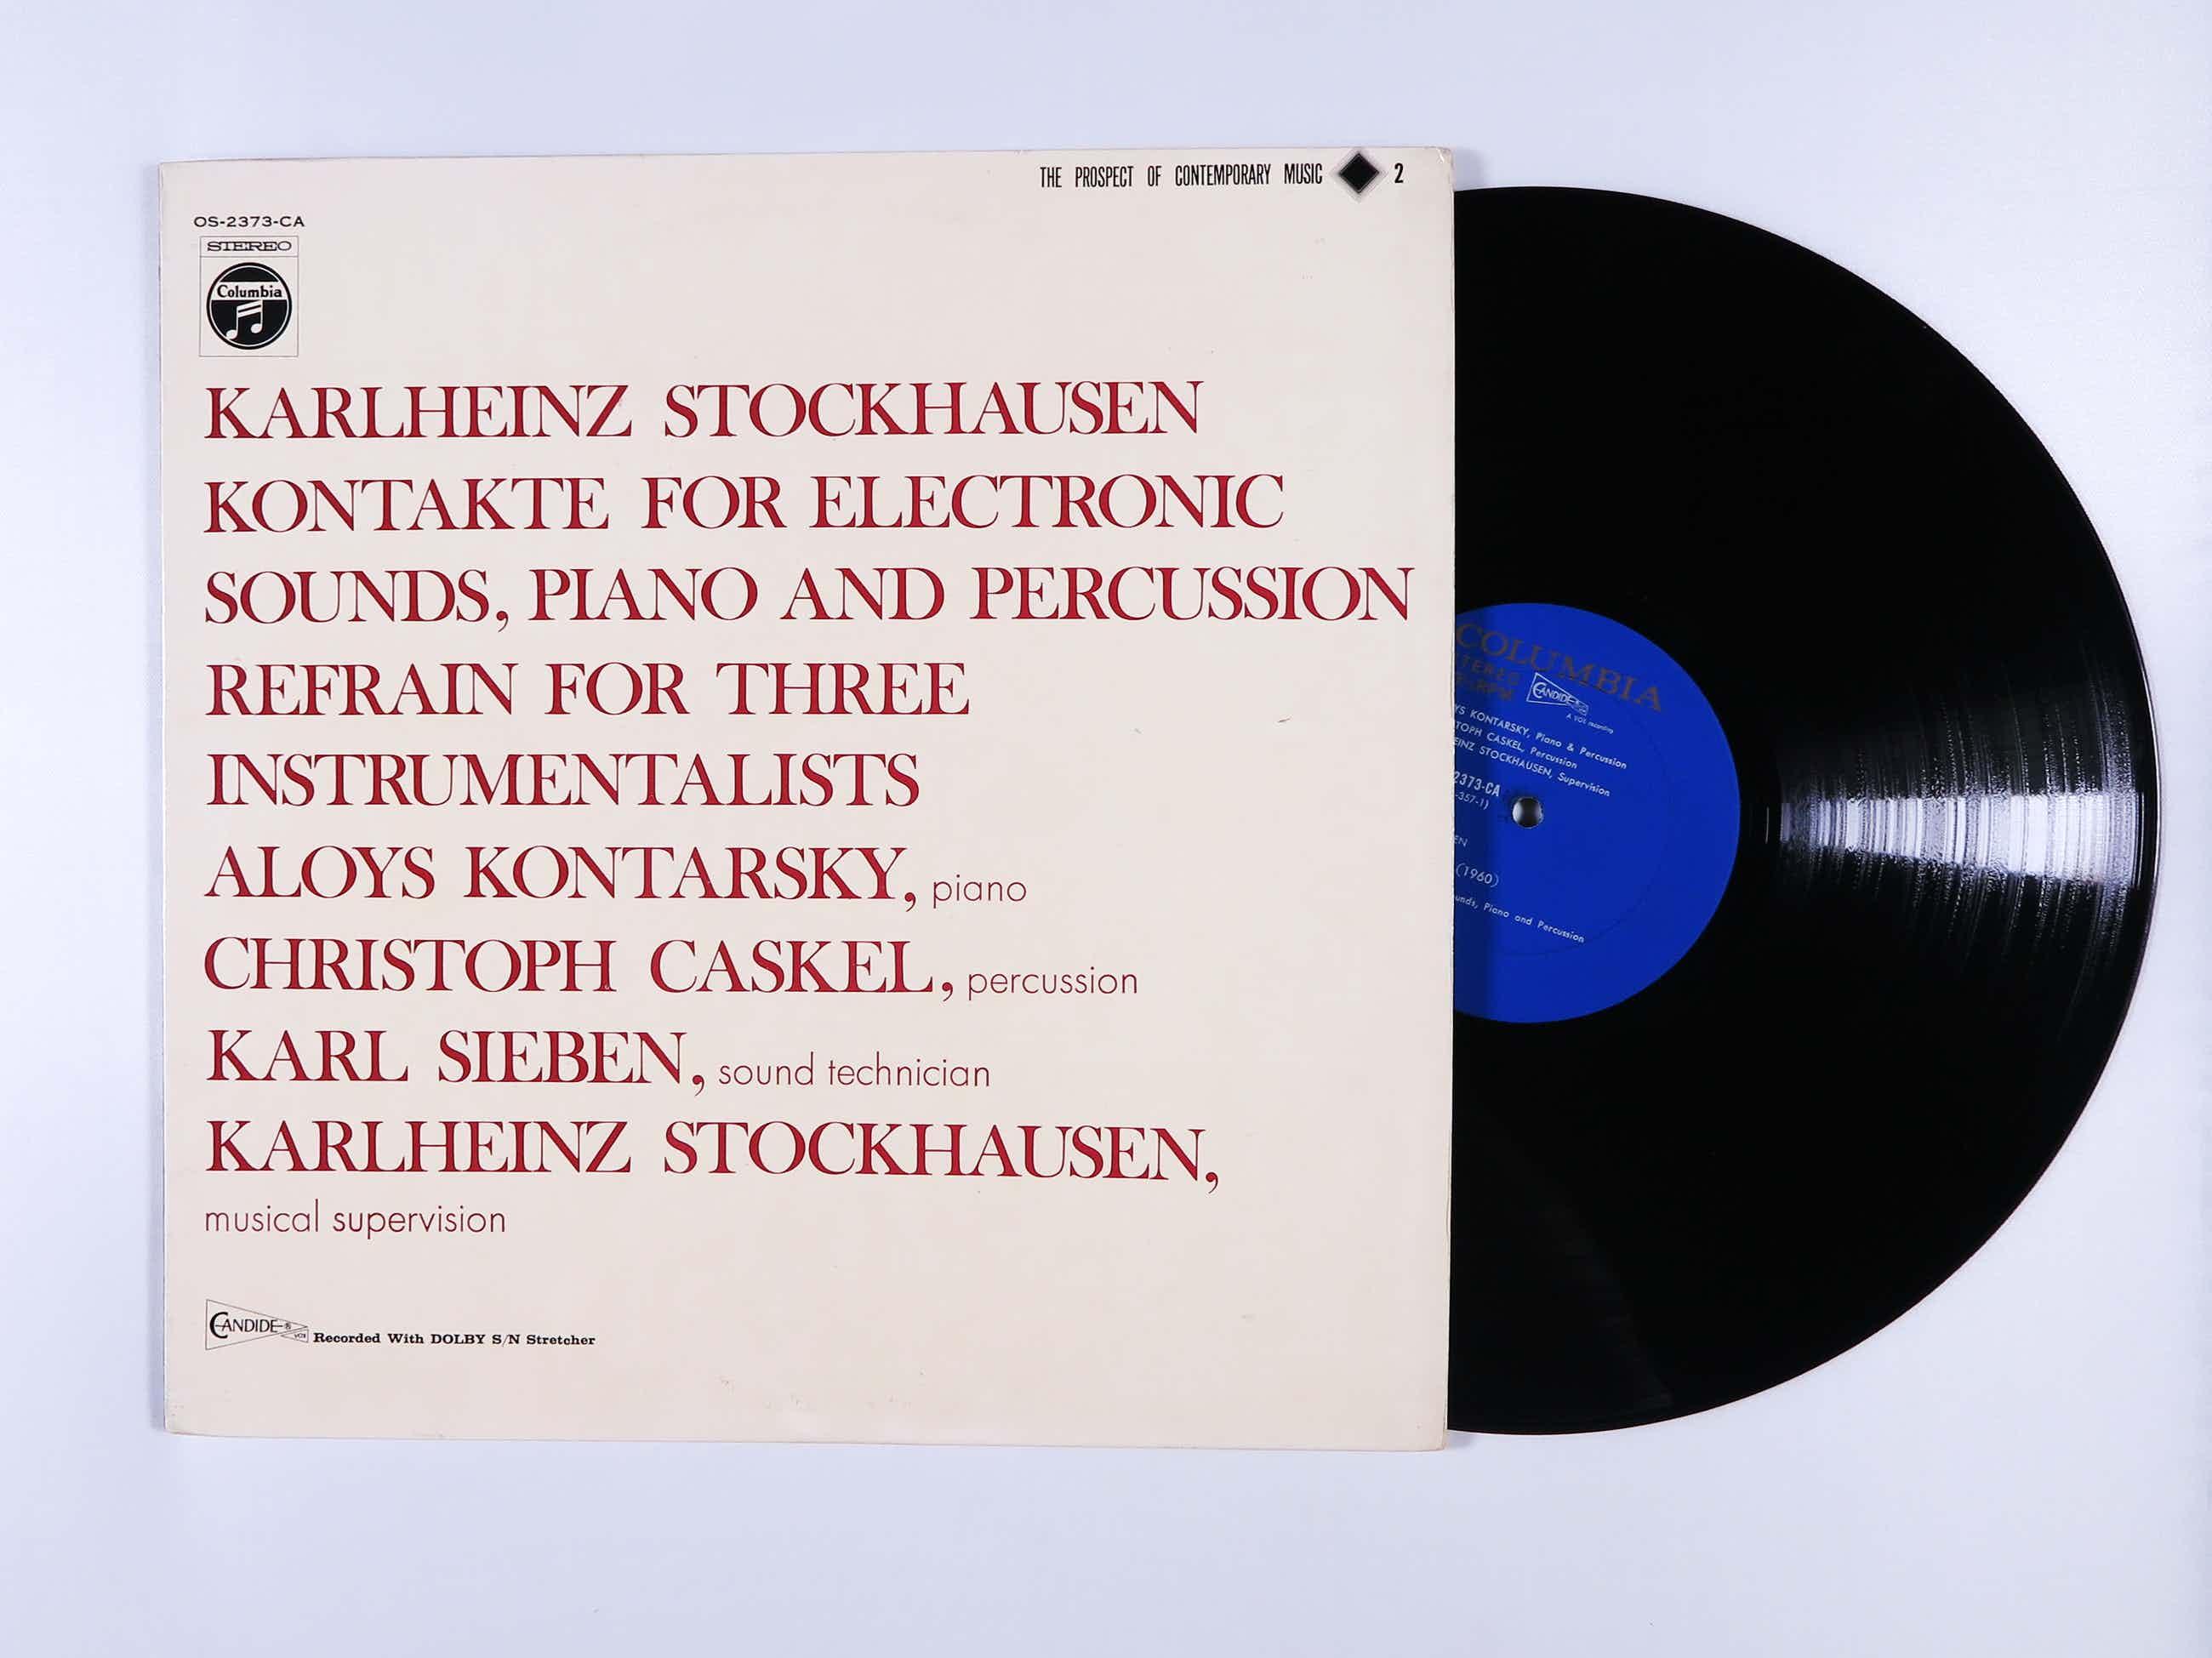 Karlheinz Stockhausen - Kontakte / Refrain kopen? Bied vanaf 25!